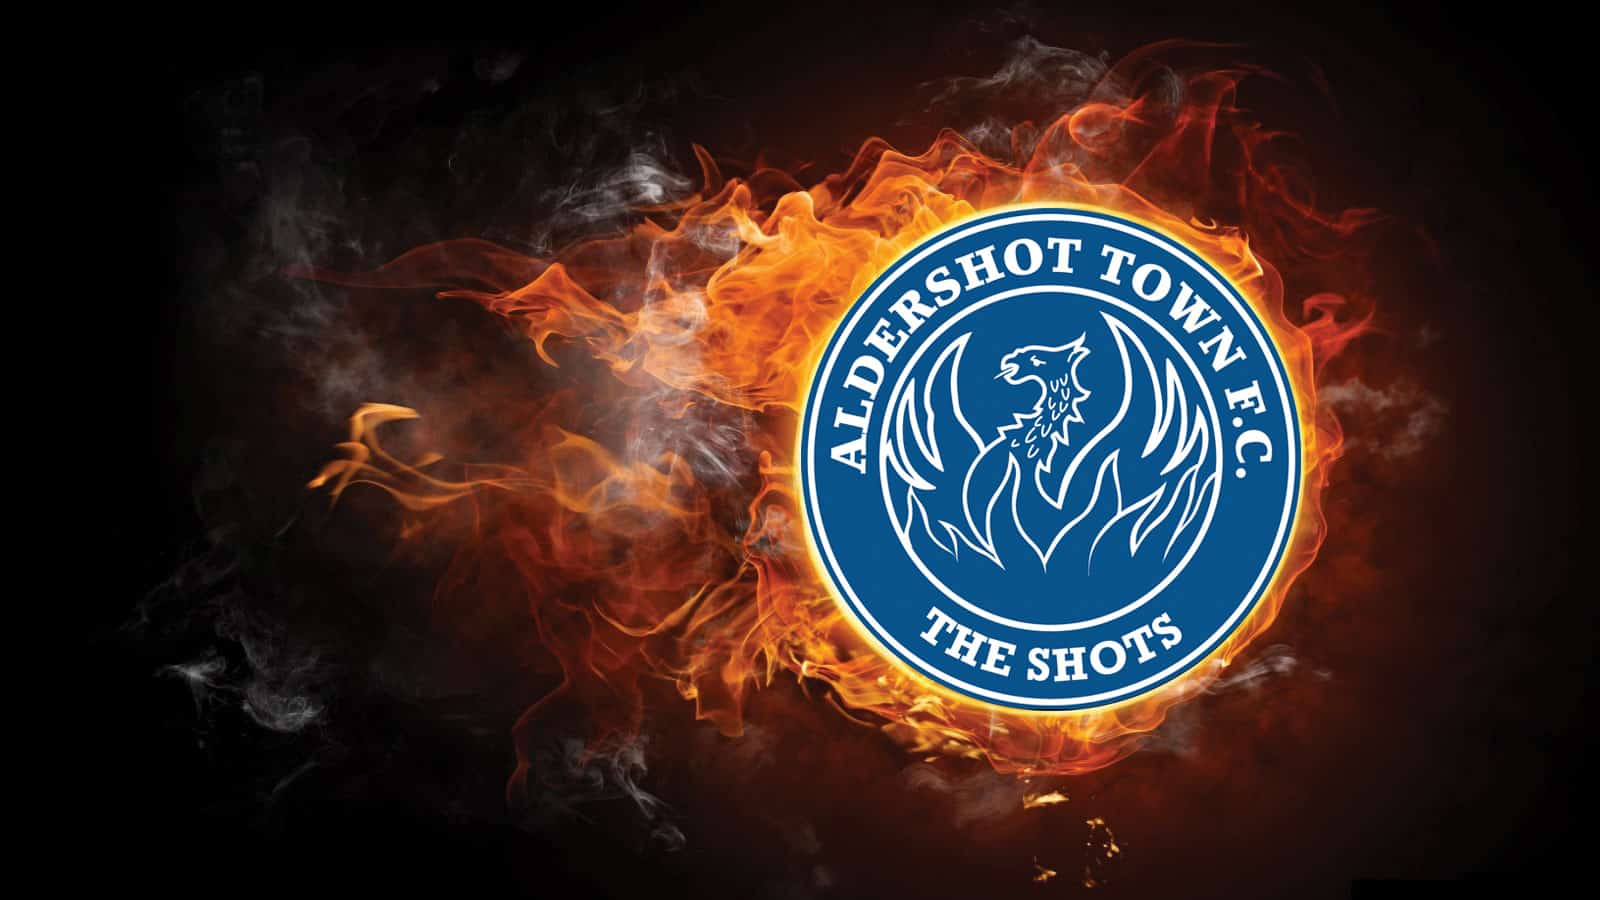 Football Clubs: Contact Aldershot Town Football Club